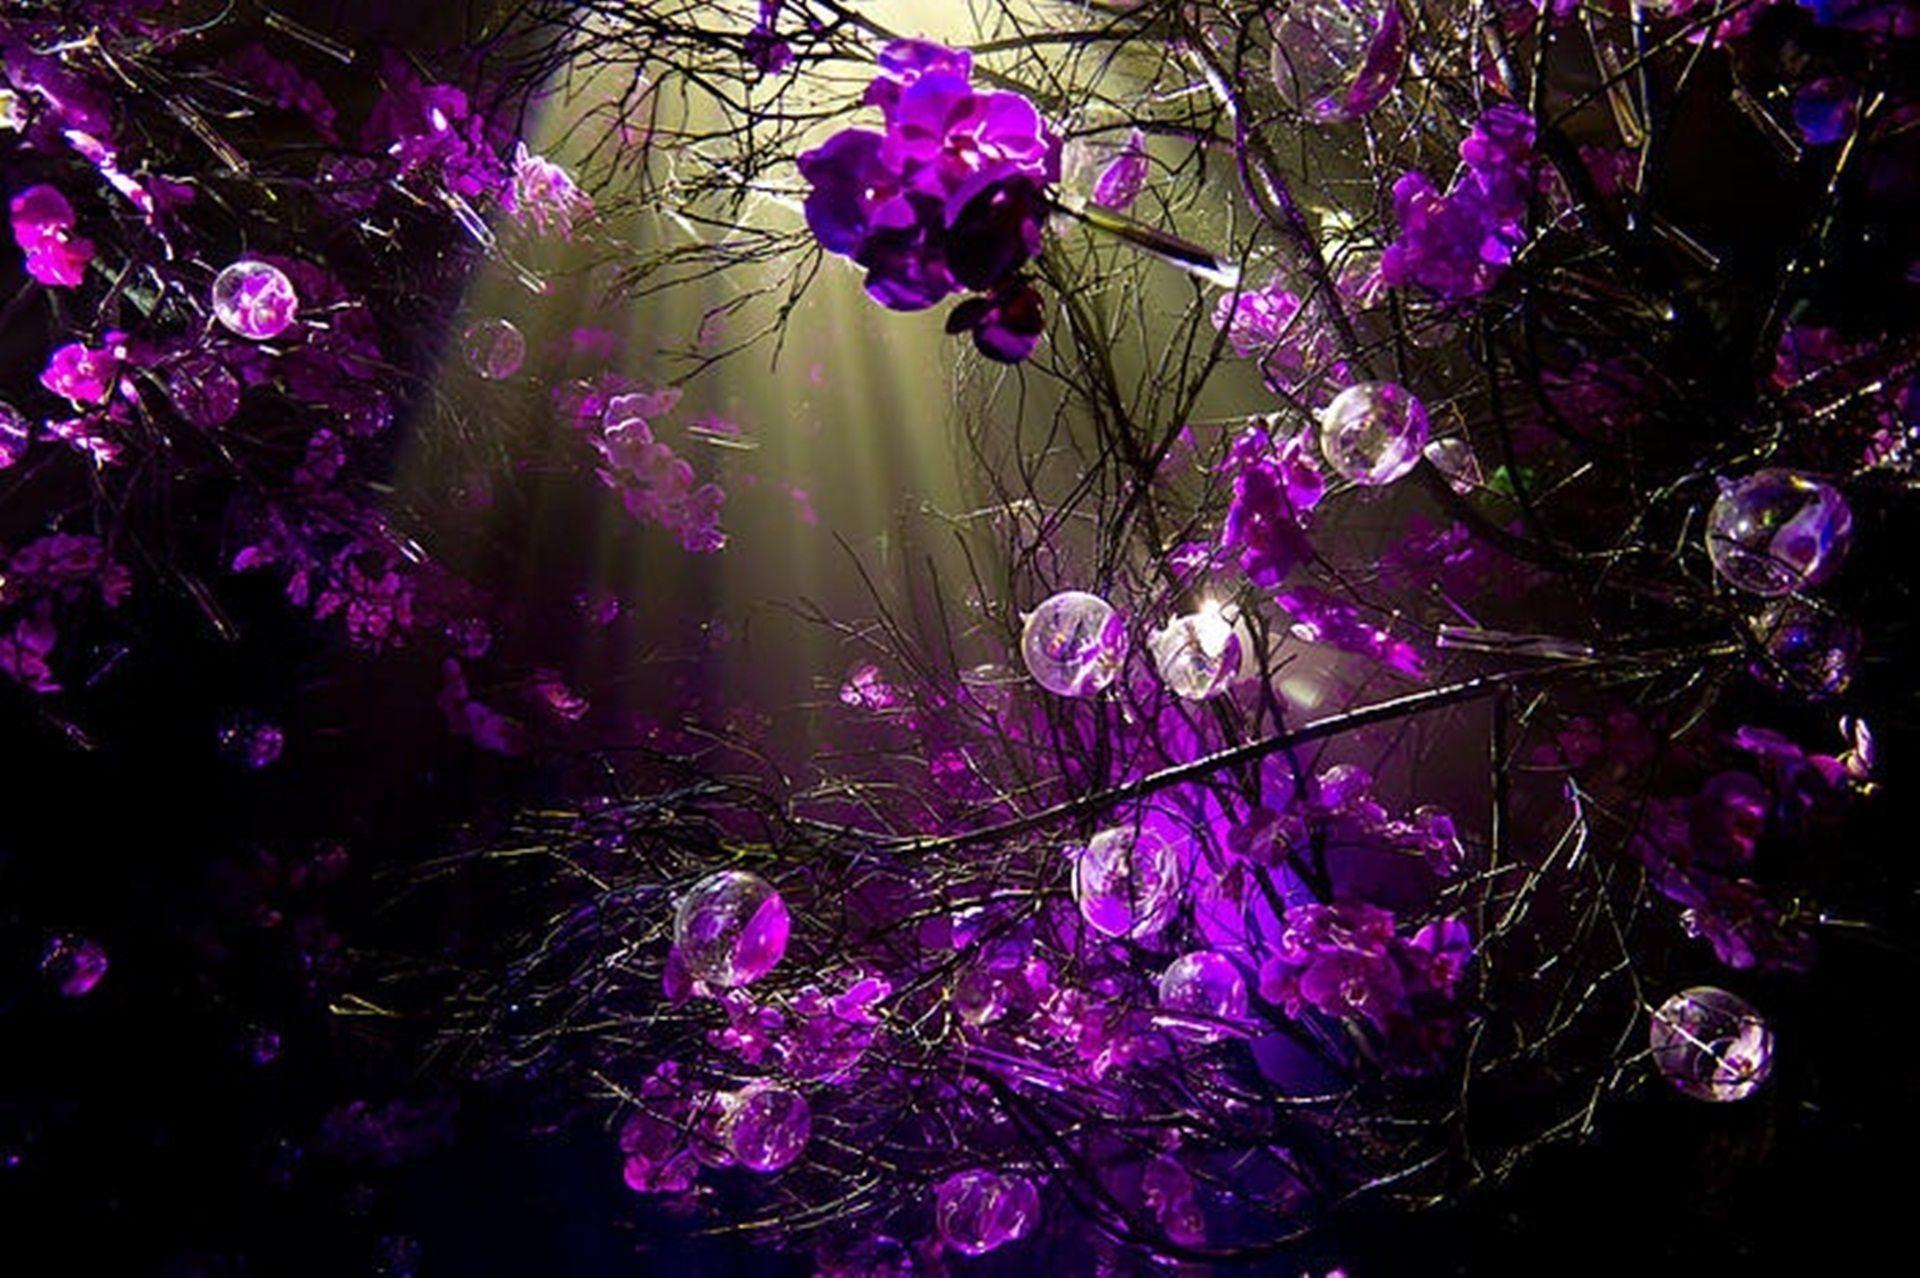 Purple wallpapers for desktop wallpaper cave for Purple kitchen wallpaper